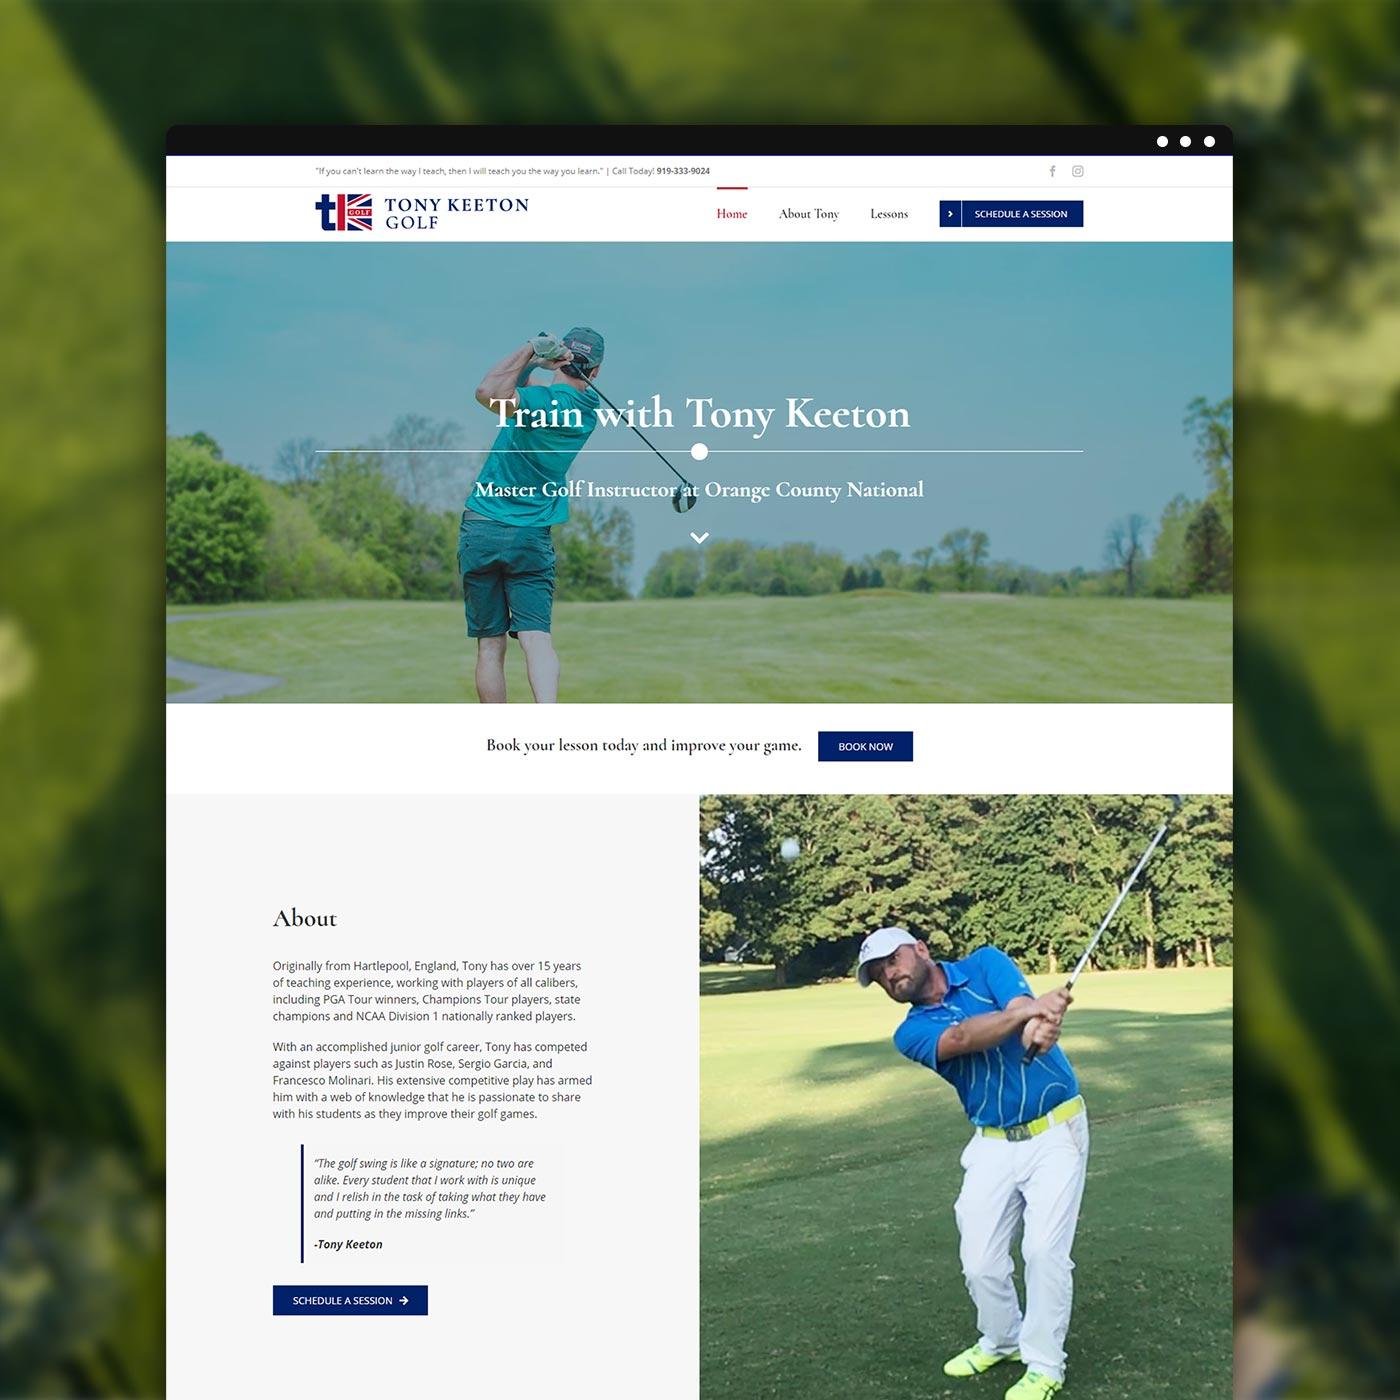 New business website for Tony Keeton Golf, golf instructor